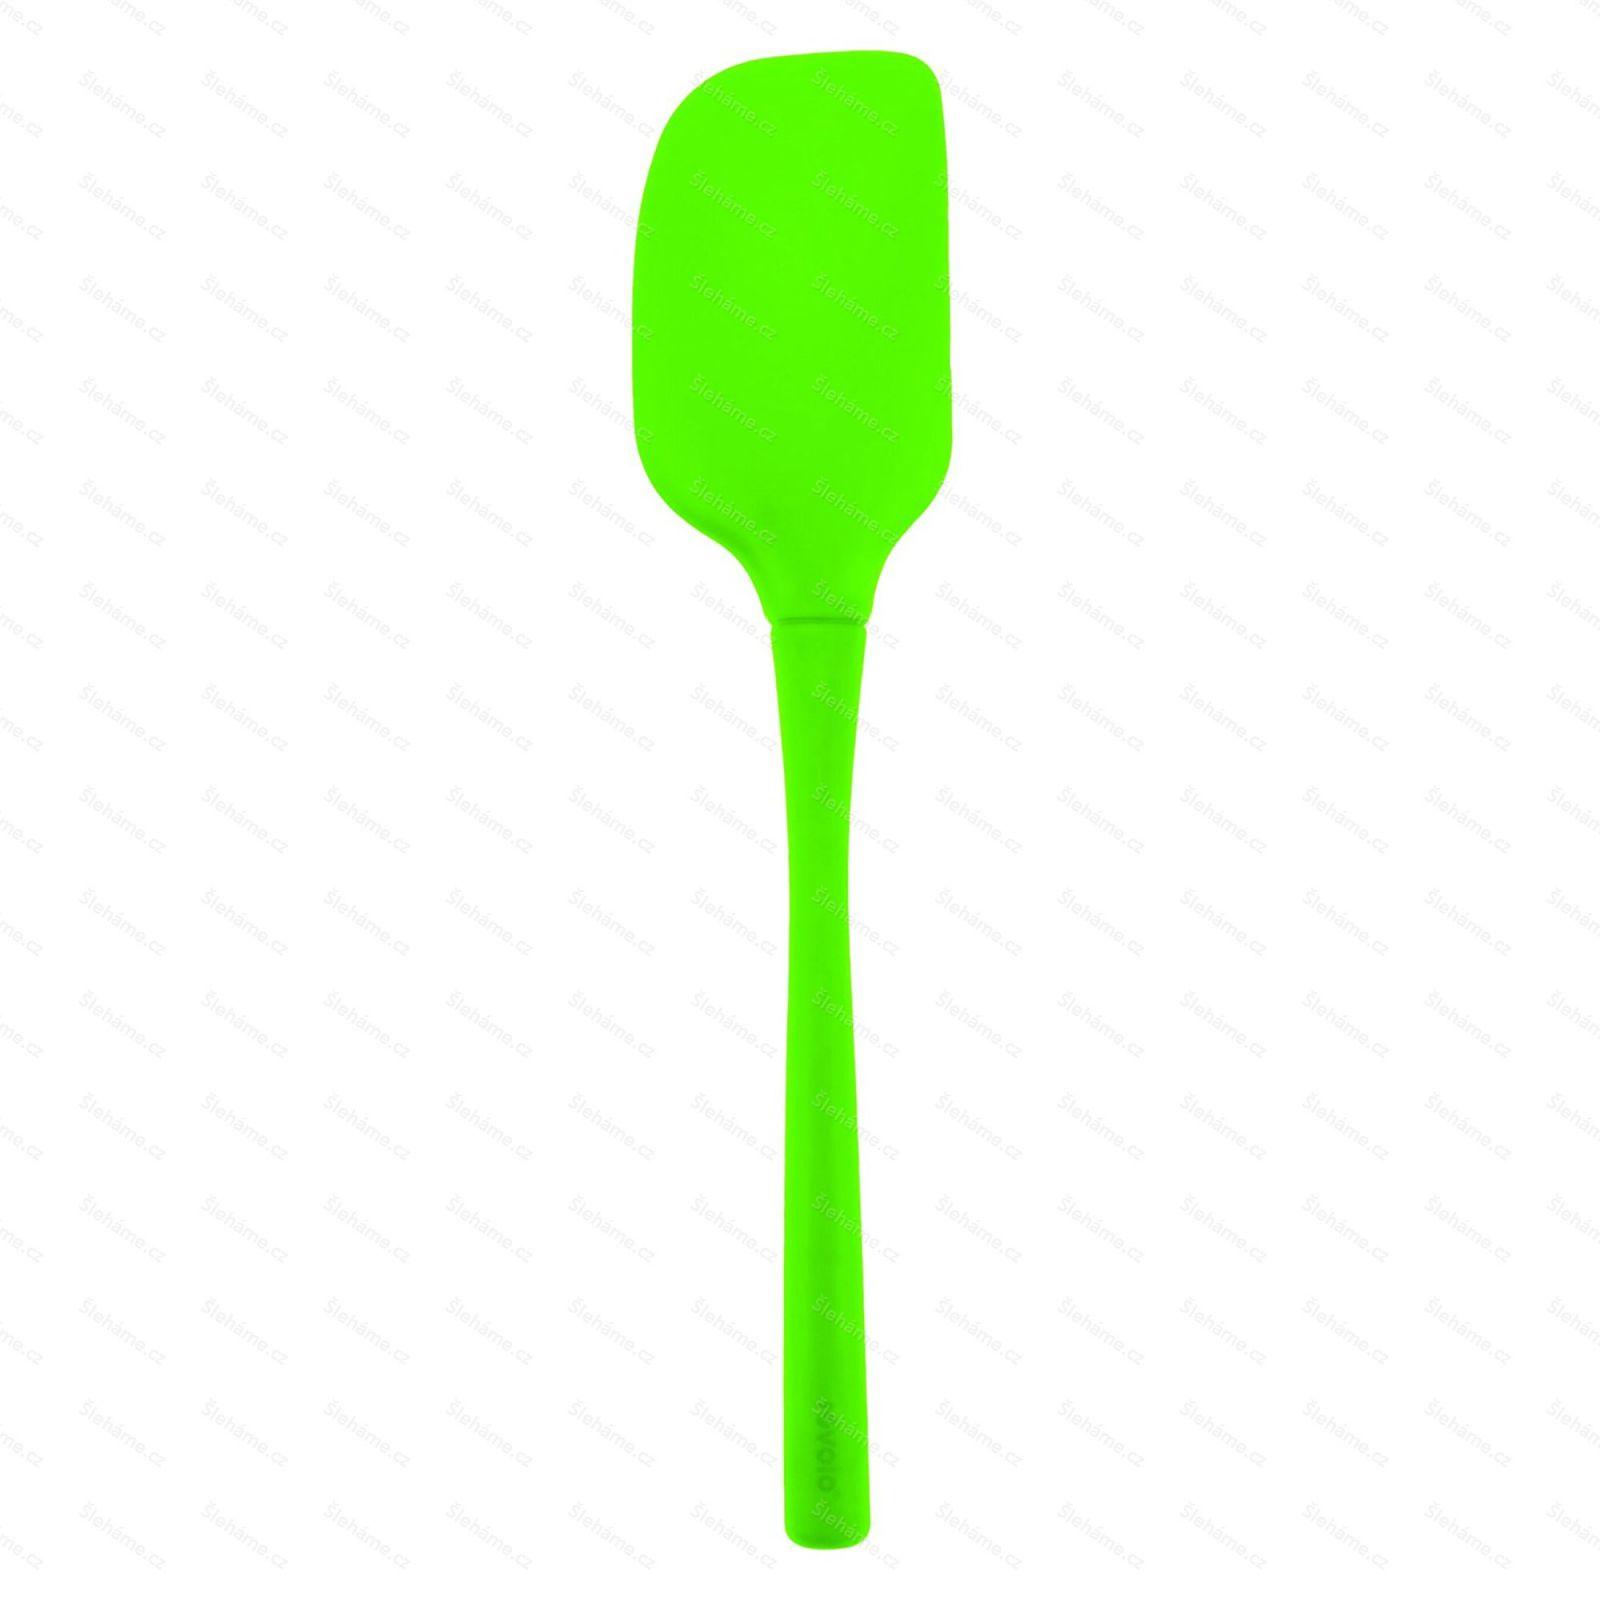 Stěrka Tovolo FLEX-CORE Jumbo, zelená